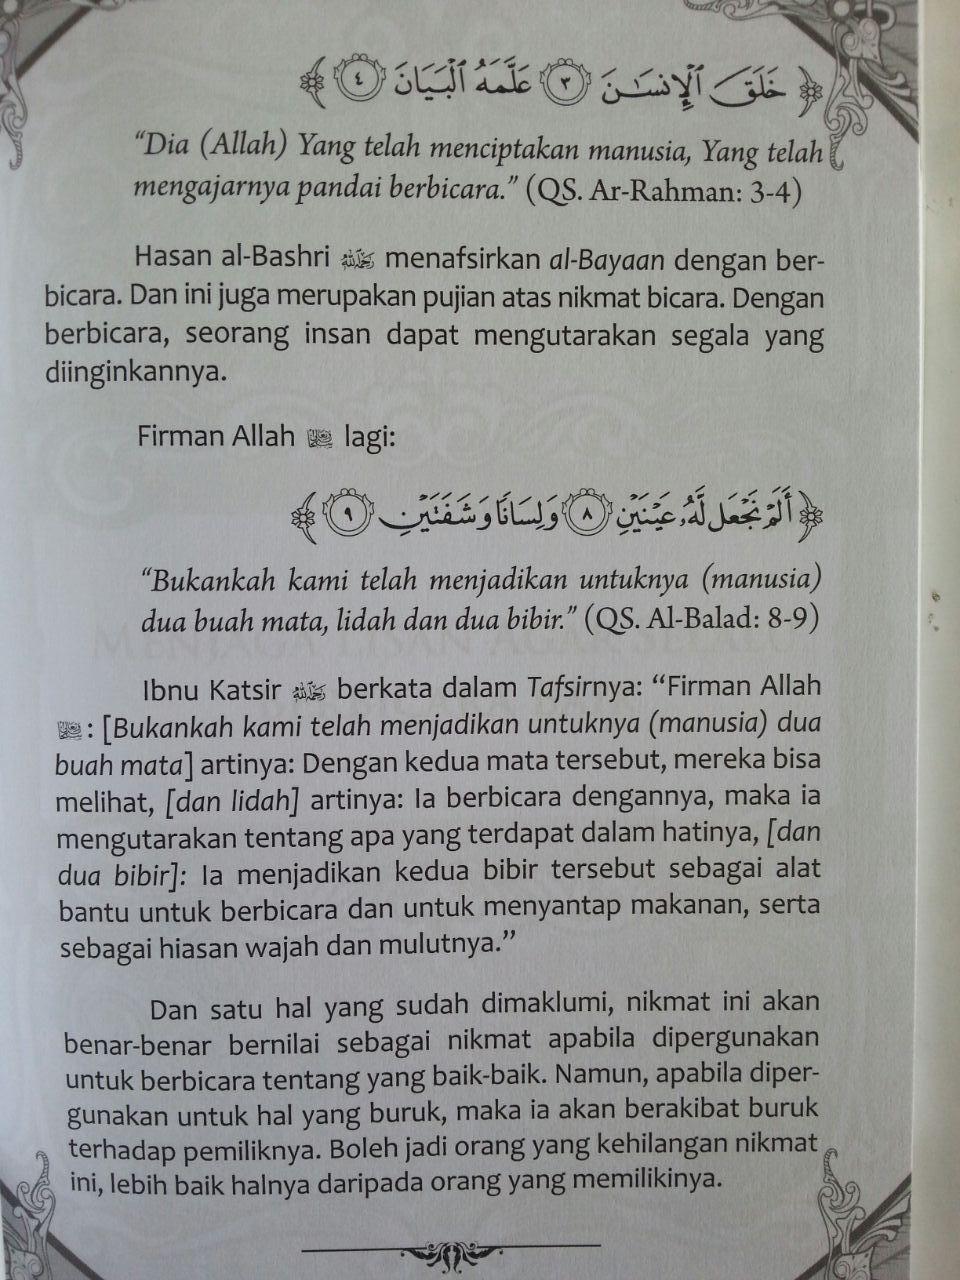 Buku Lembutnya Dakwah Ahlussunnah isi 3